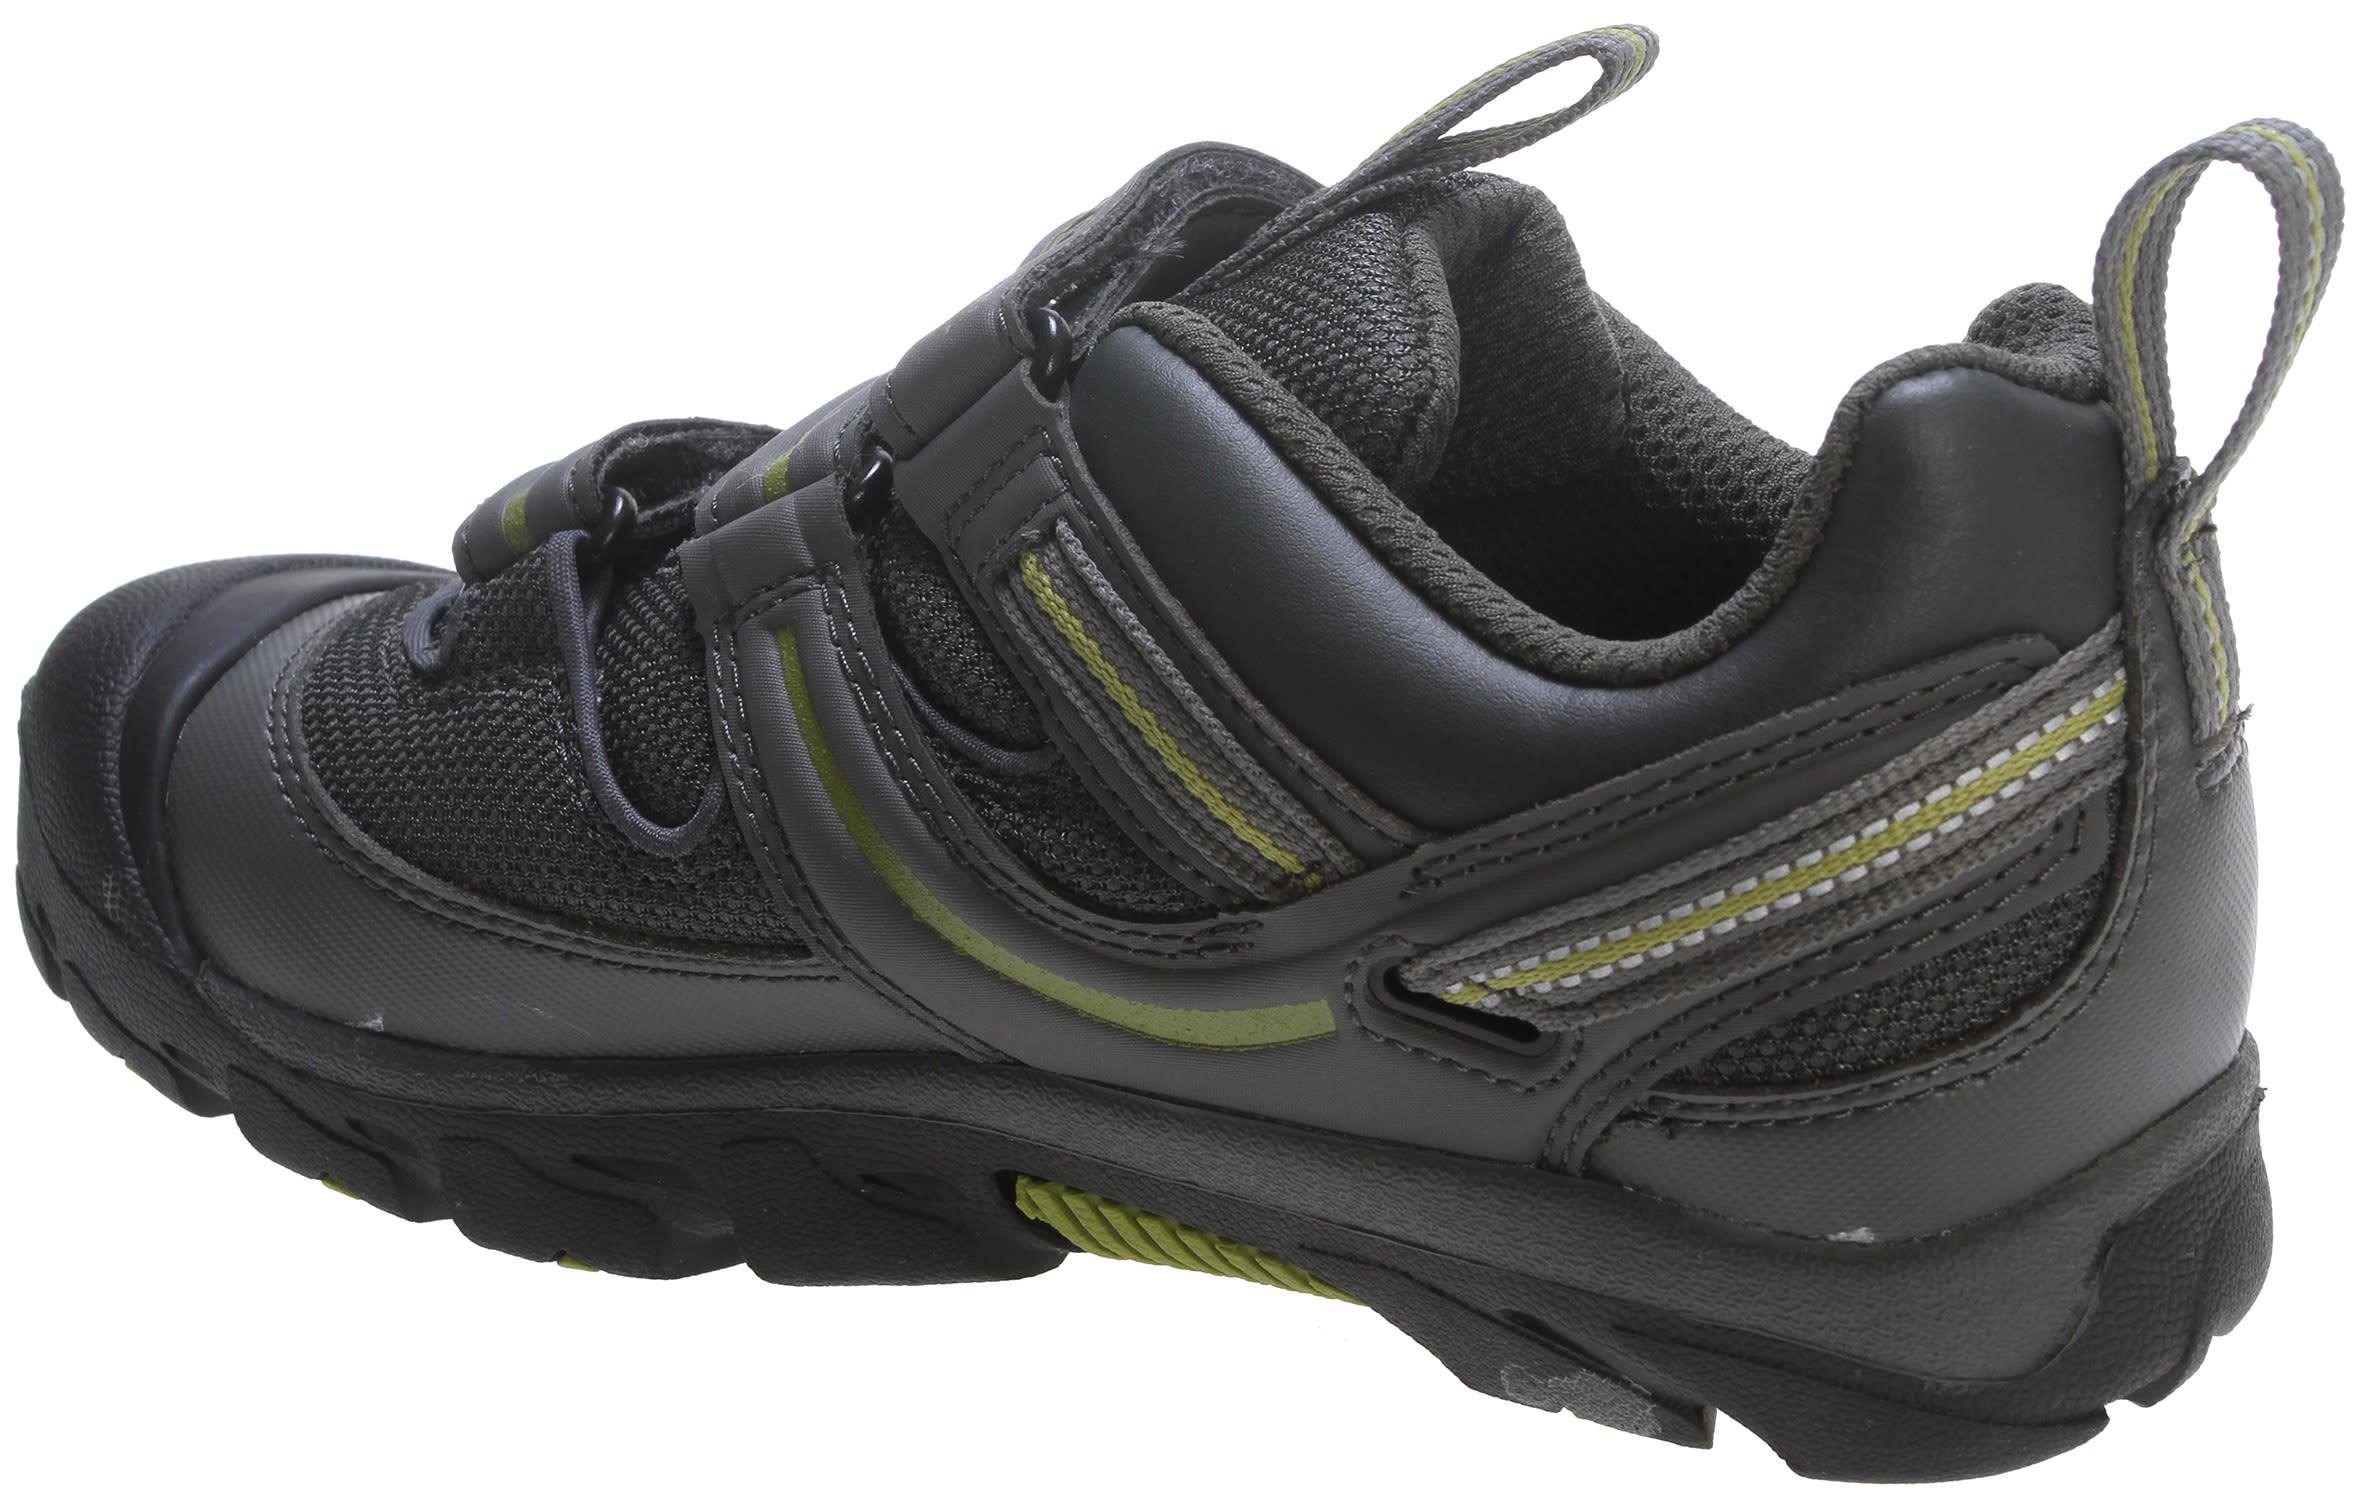 37d725929eb1 Keen Springwater II Bike Shoes - thumbnail 3